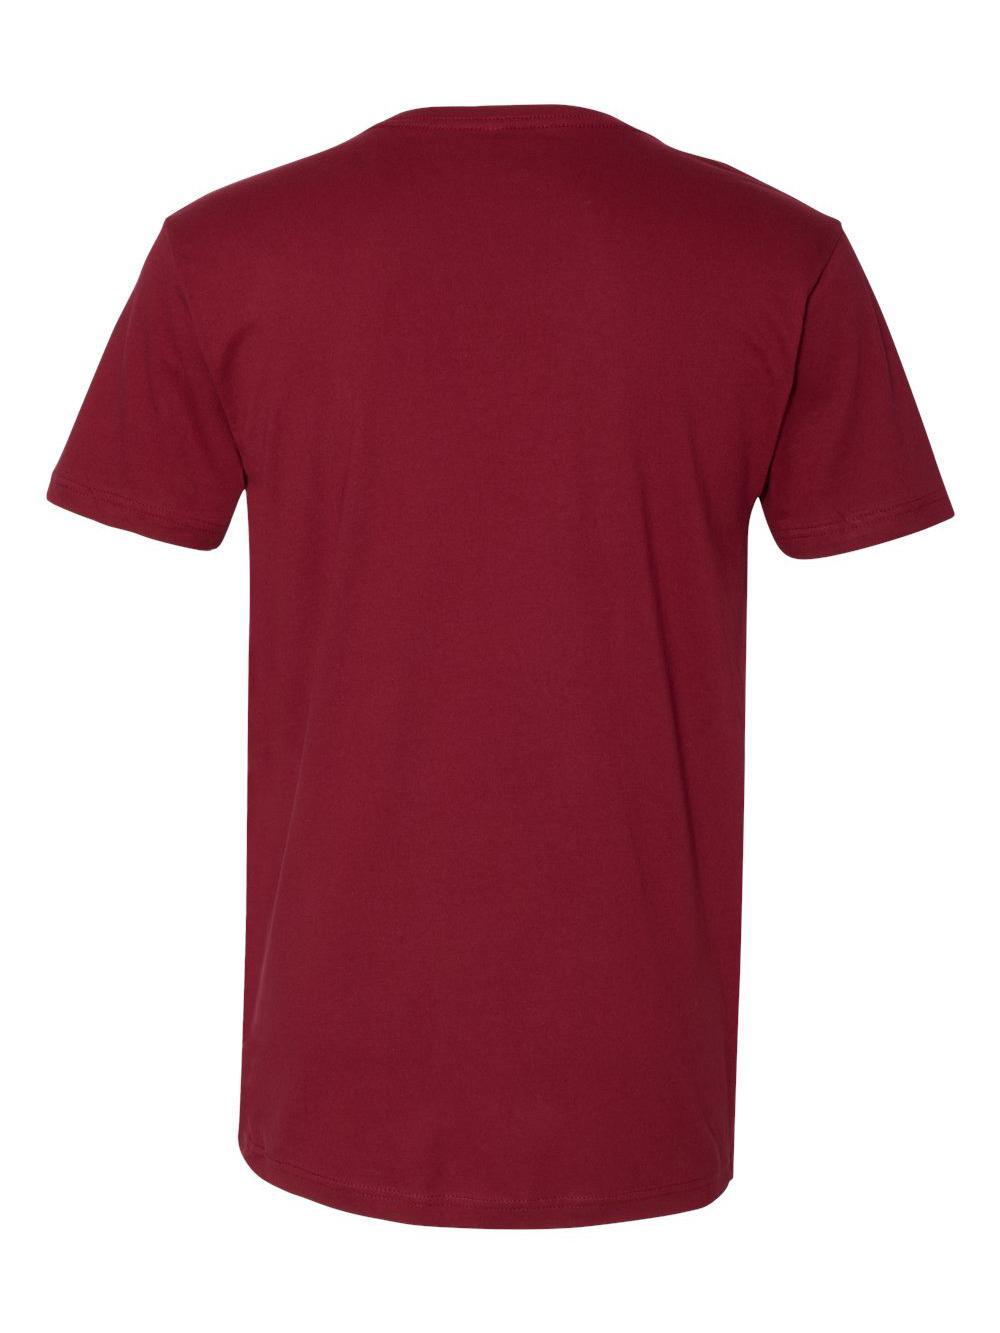 Next-Level-Premium-Short-Sleeve-V-3200 thumbnail 10